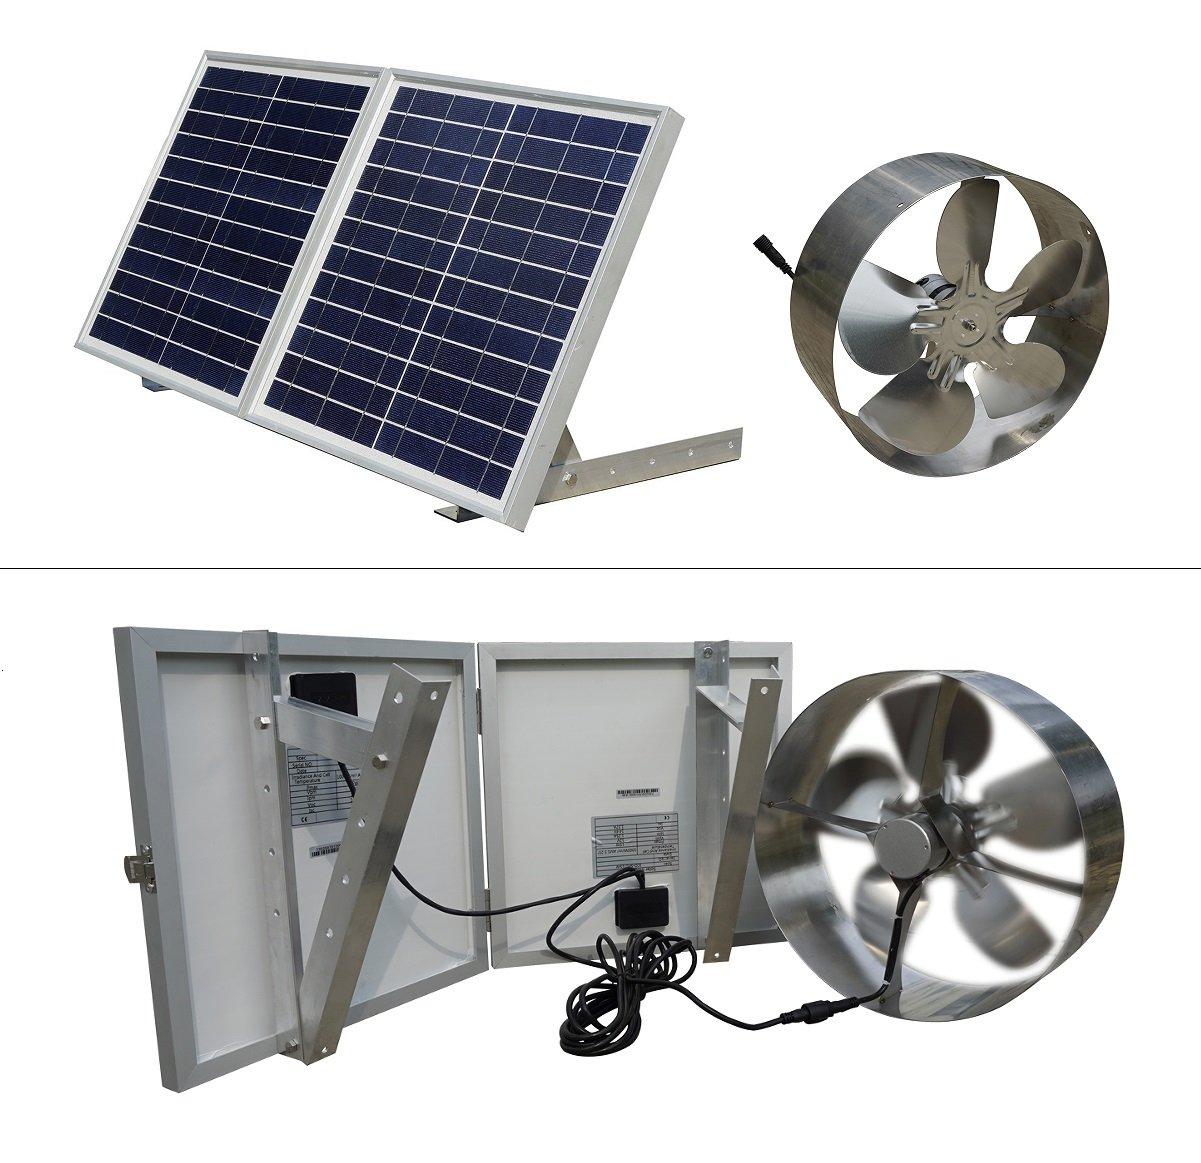 ECO-WORTHY 25W Solar Powered Attic Ventilator Gable Roof Vent Fan with 30W Foldable Solar Panel